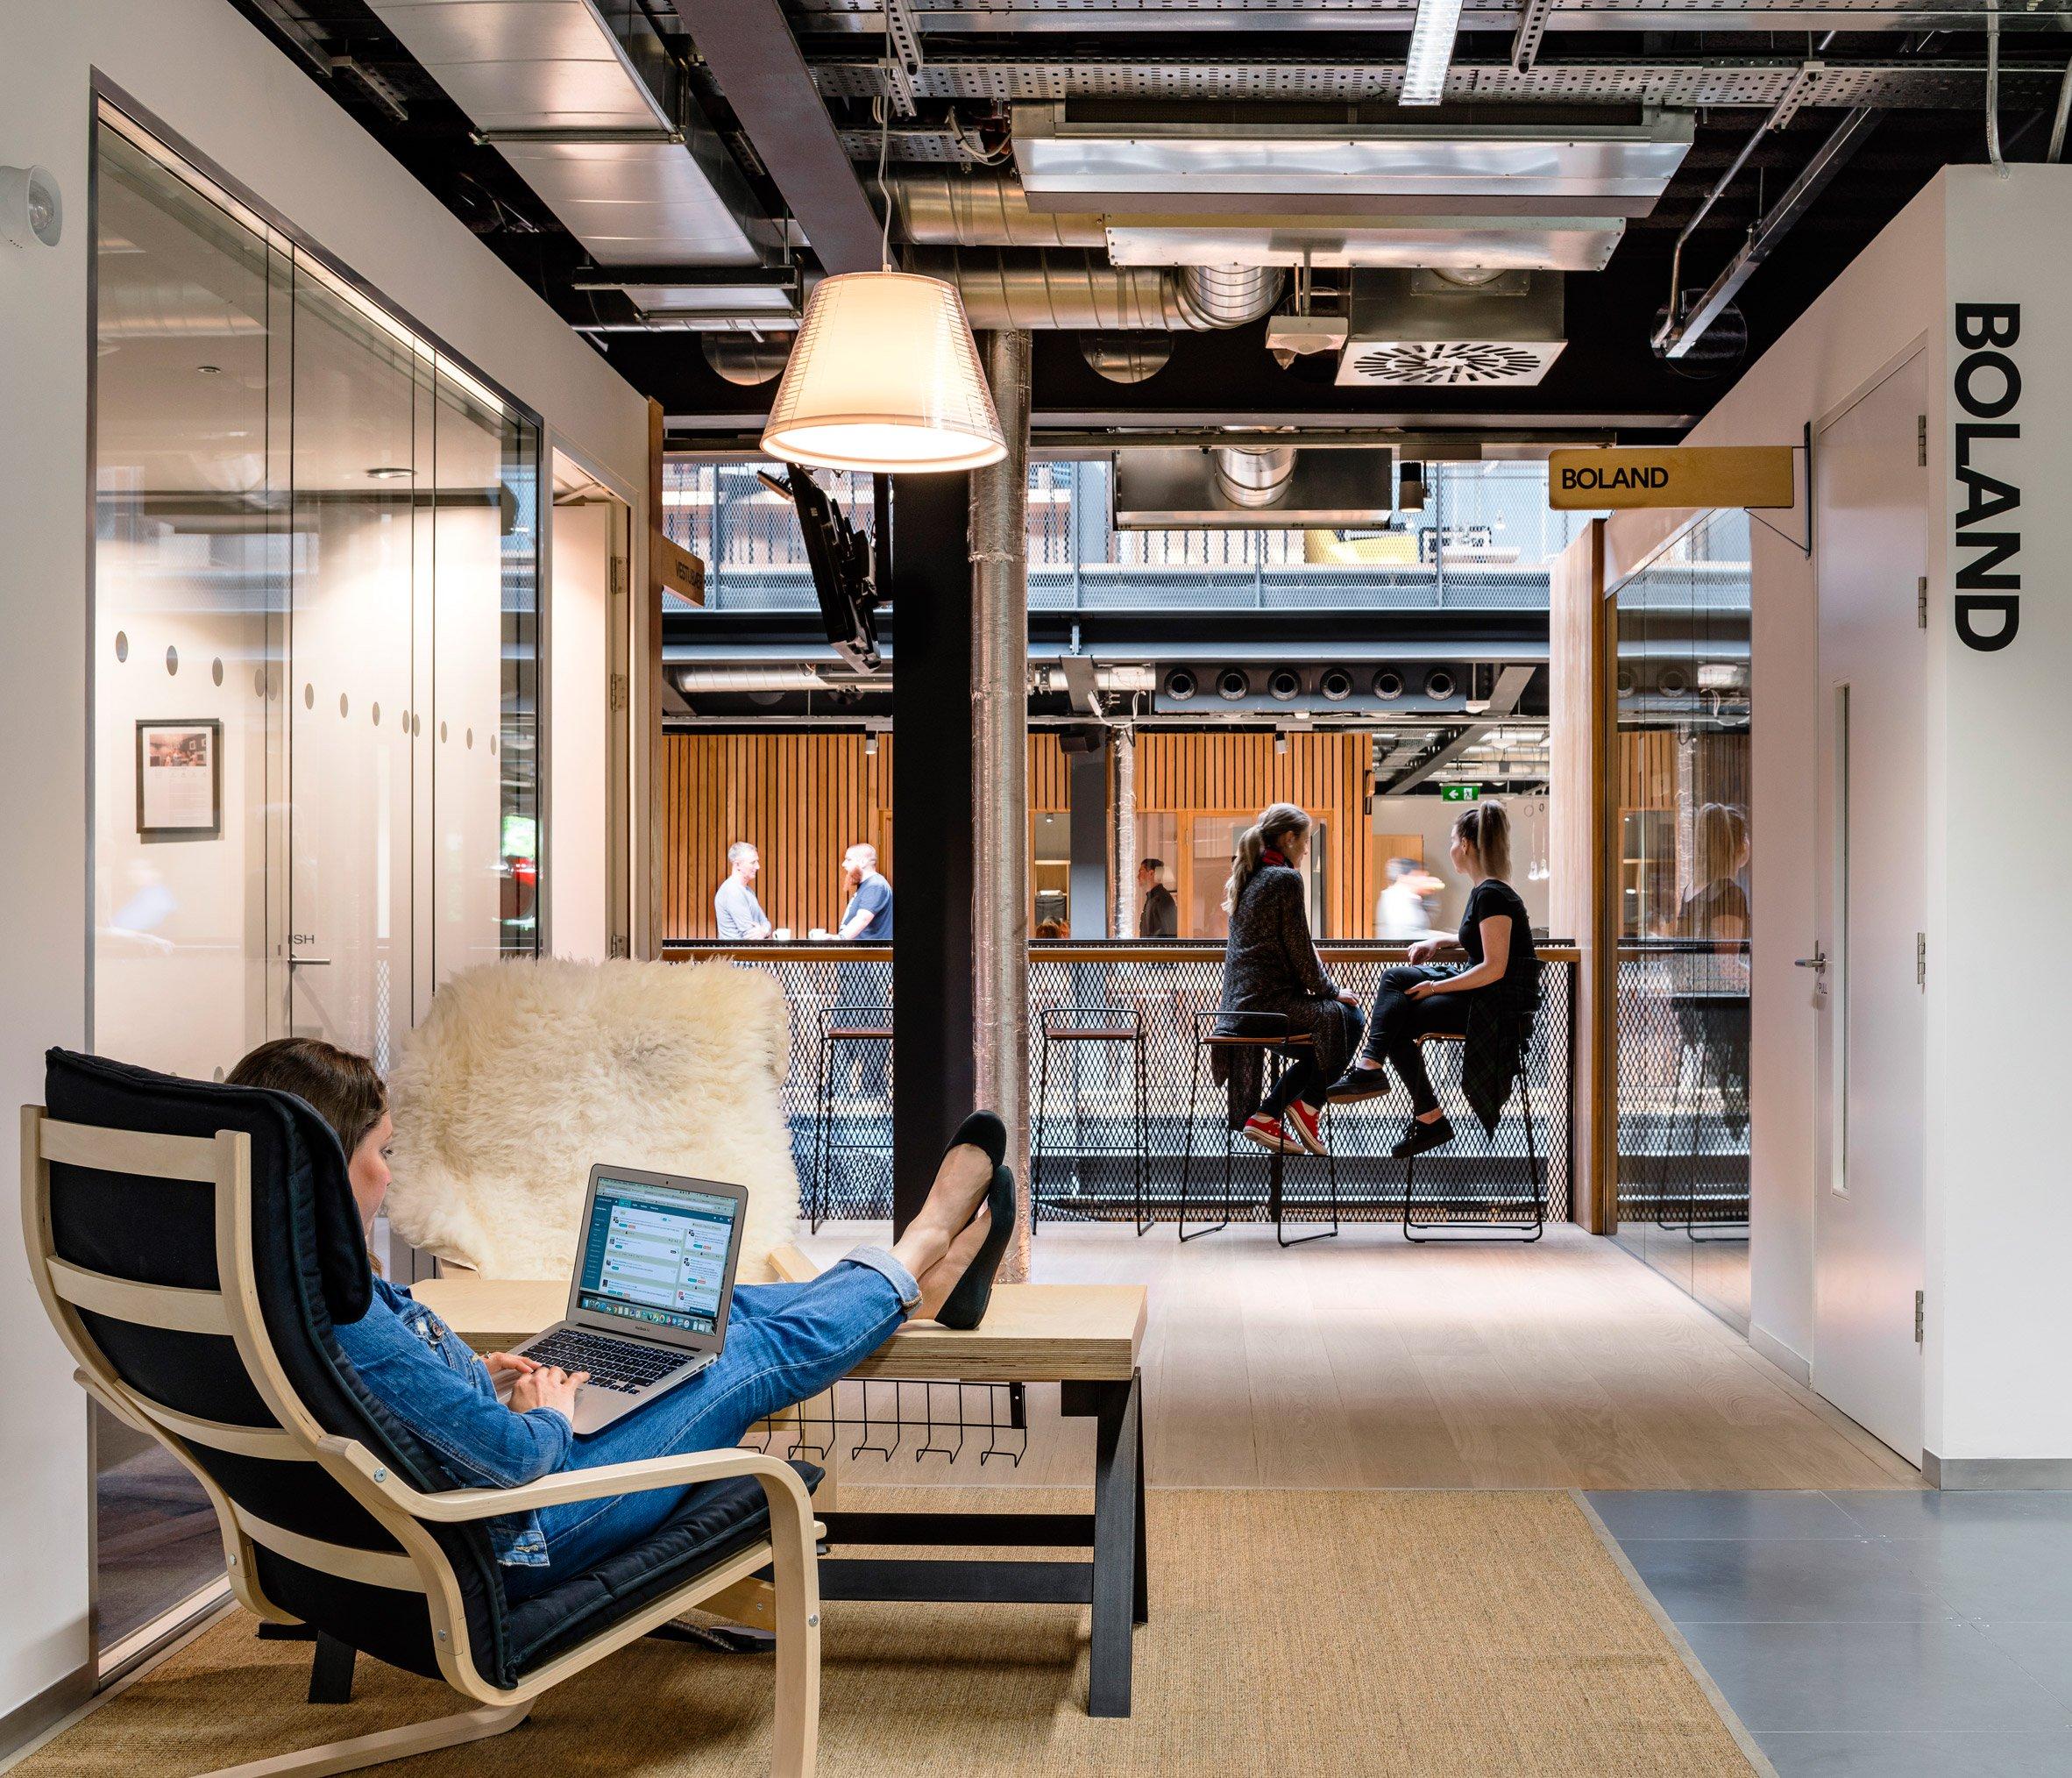 airbnb-dublin-office-interiors-ireland-offices_dezeen_2364_col_17